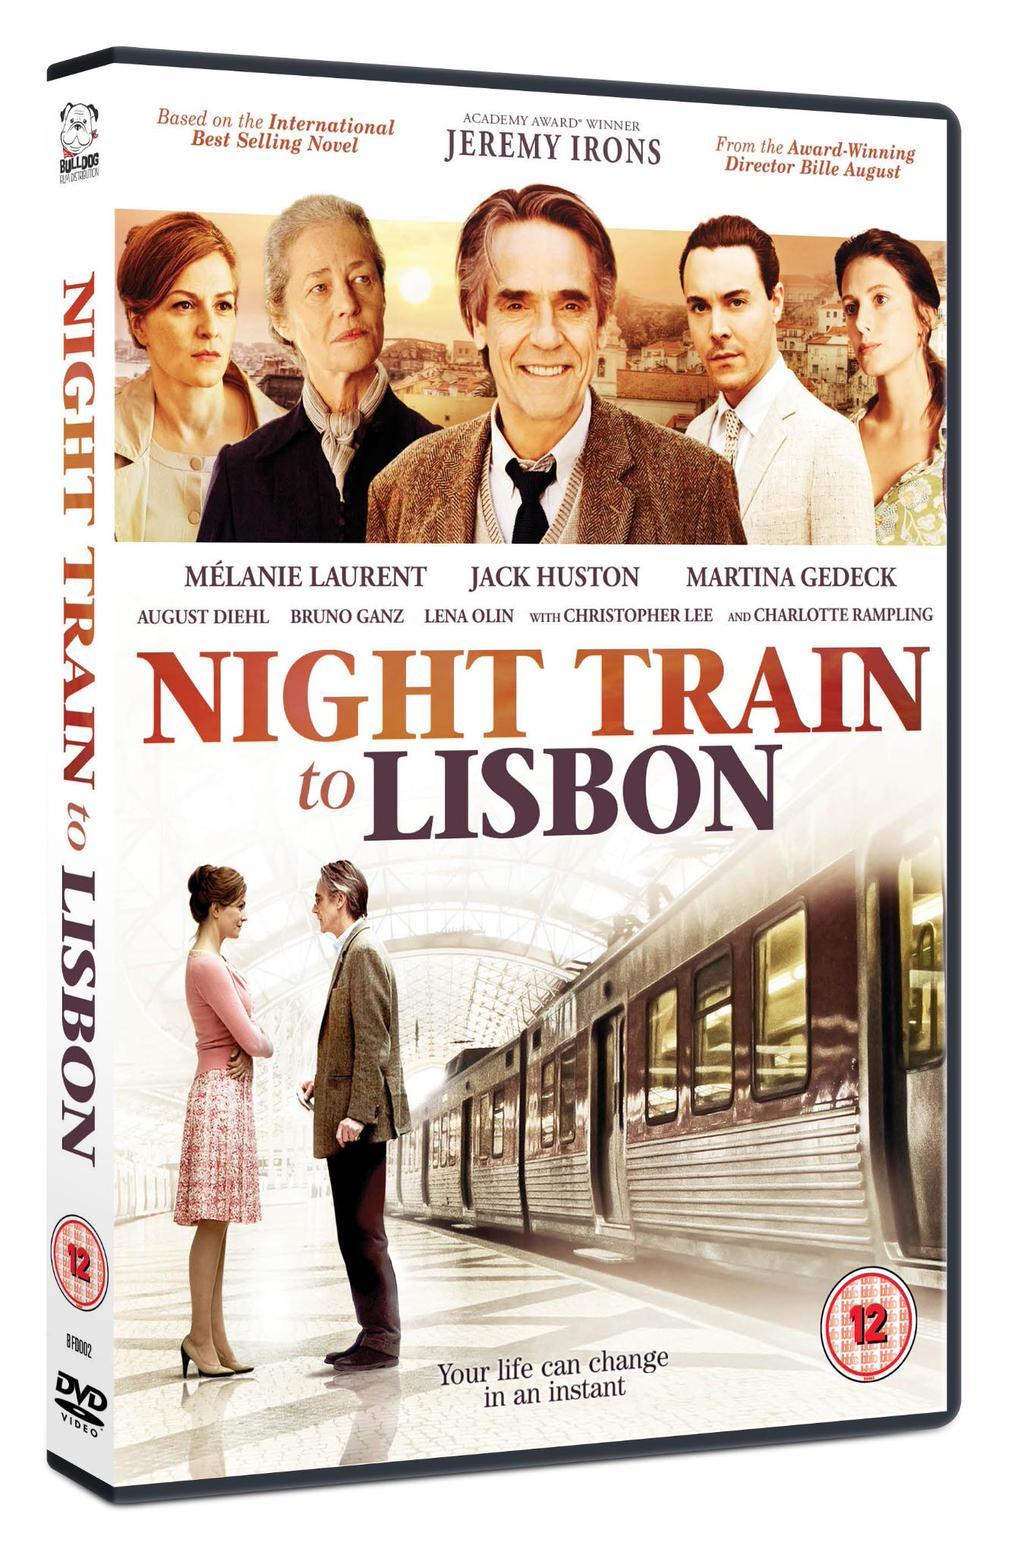 Night Train to Lisbon DVD